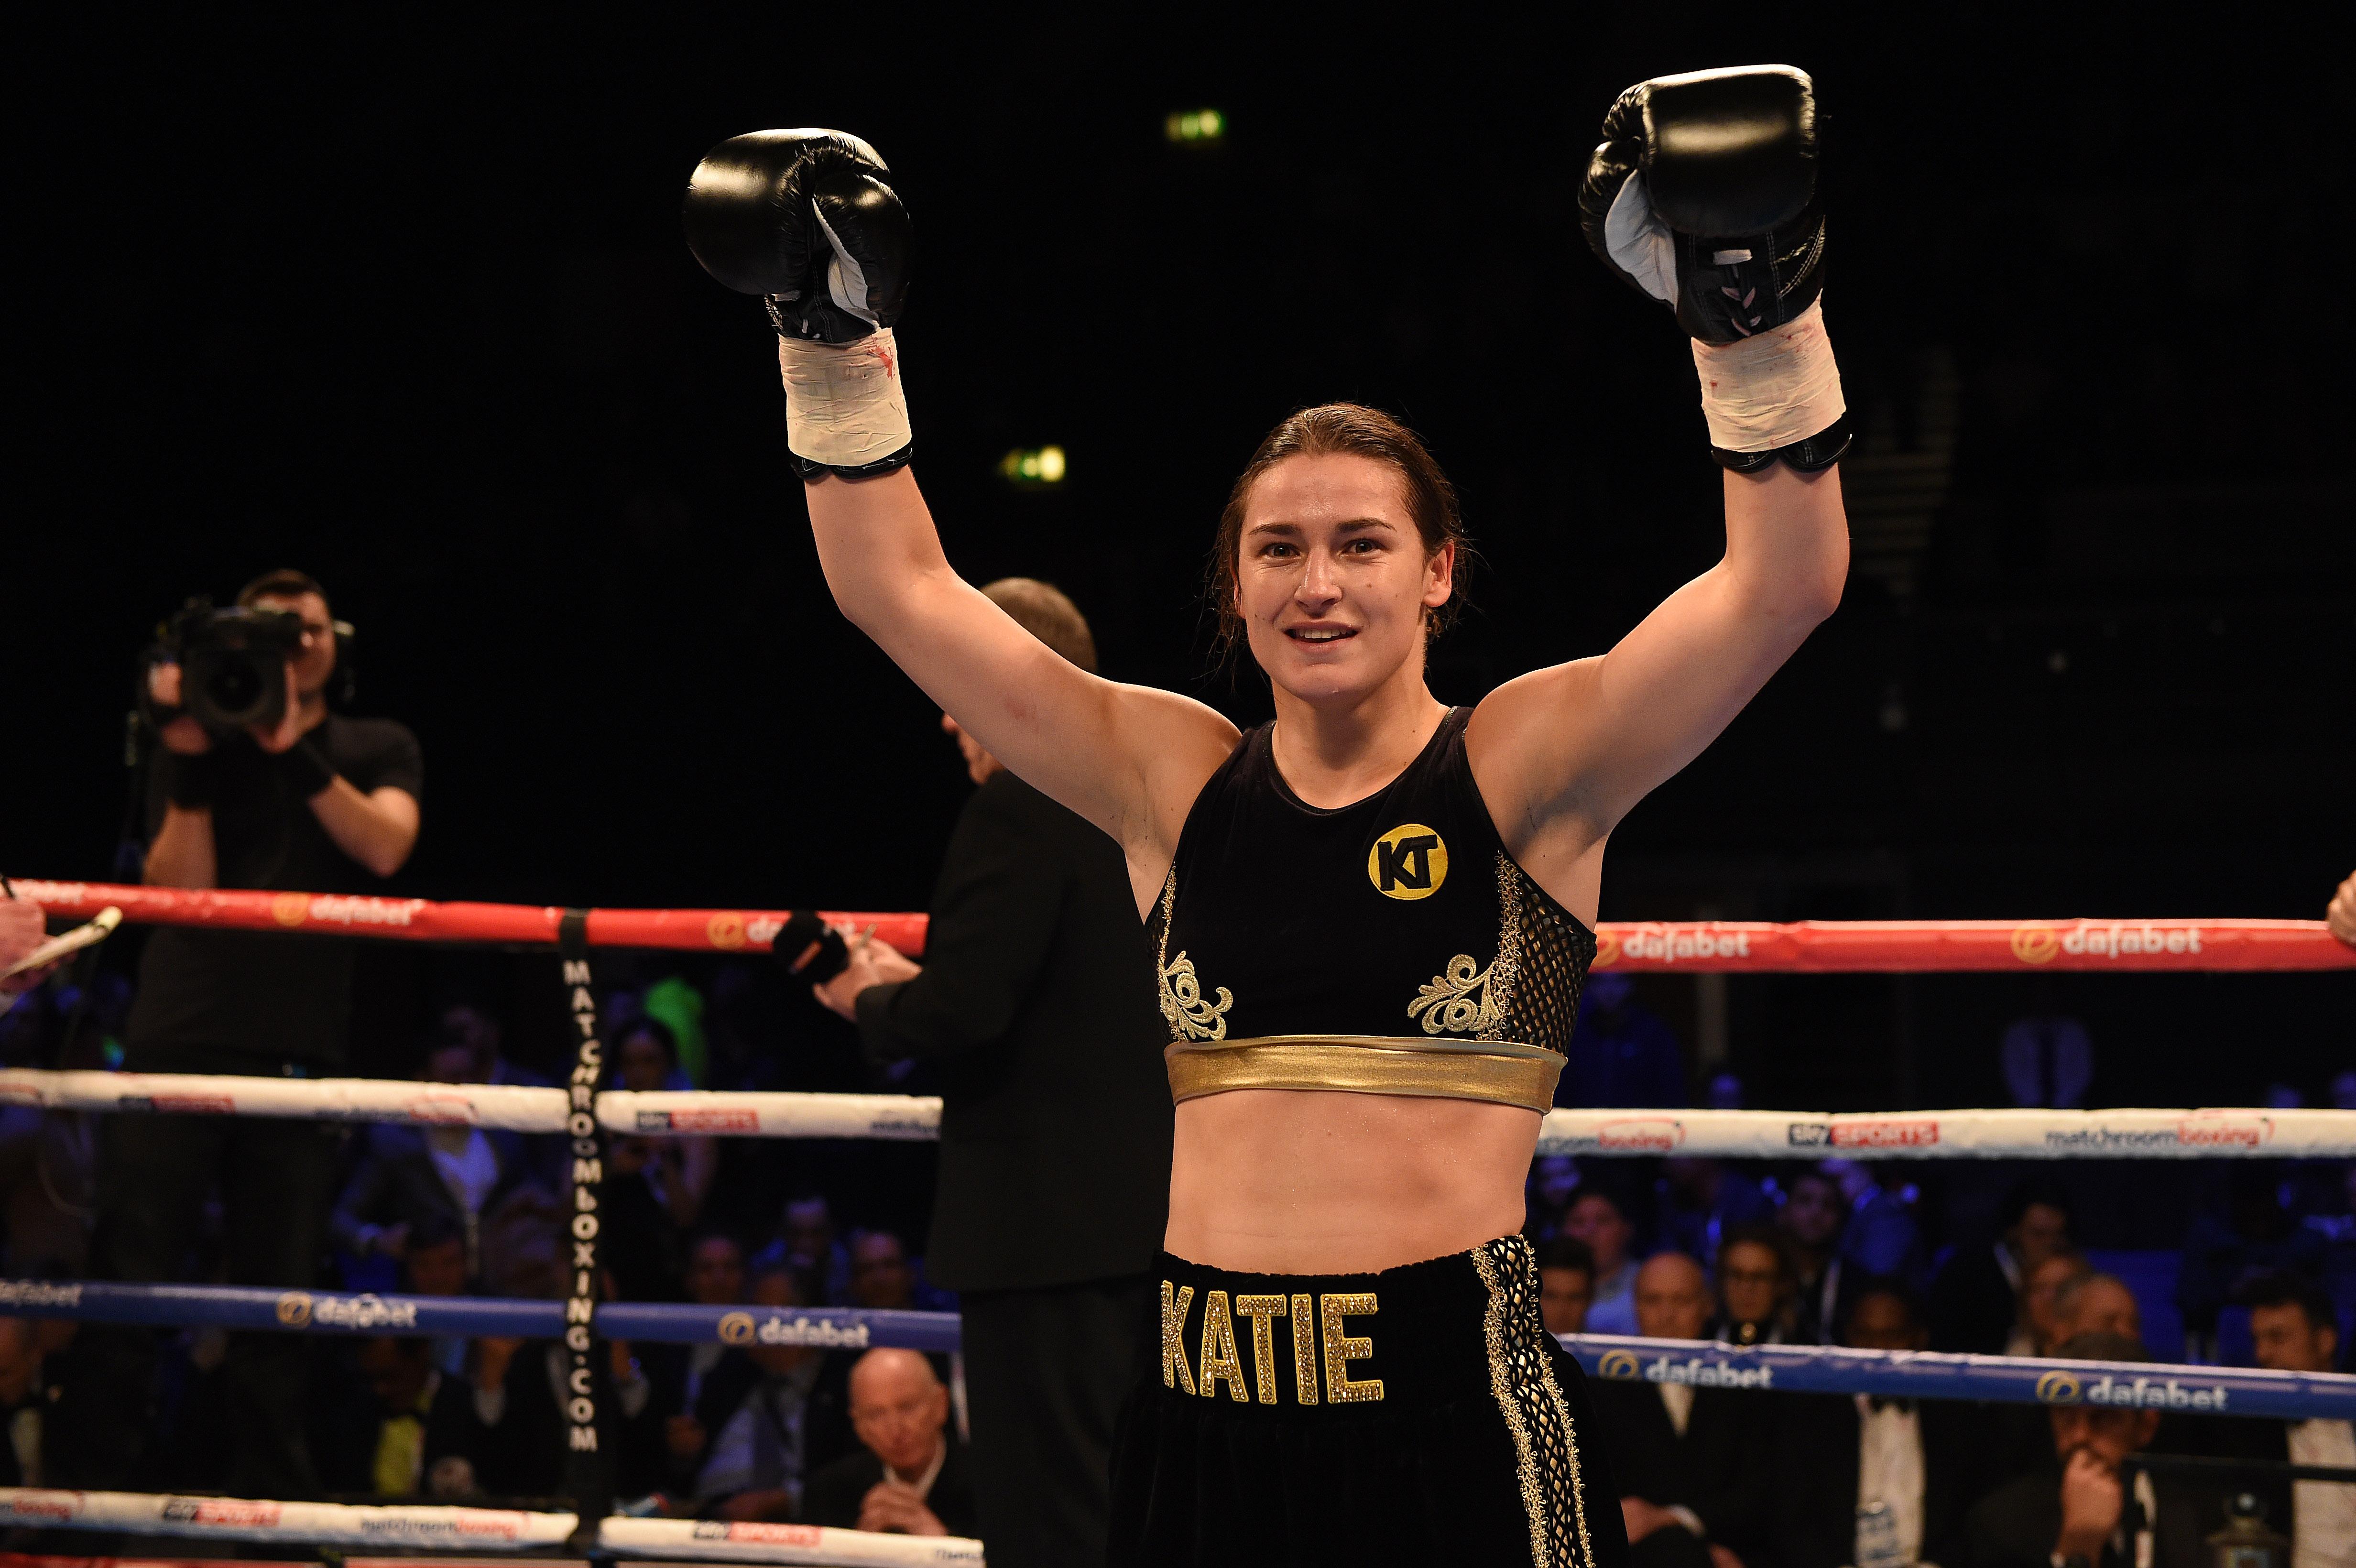 LONDON, ENGLAND - NOVEMBER 26: Katie Taylor defeats Karina Kopinska in a Lightweight contest at Wembley Arena on November 26, 2016 in London, England. (Photo by Leigh Dawney/Getty Images)